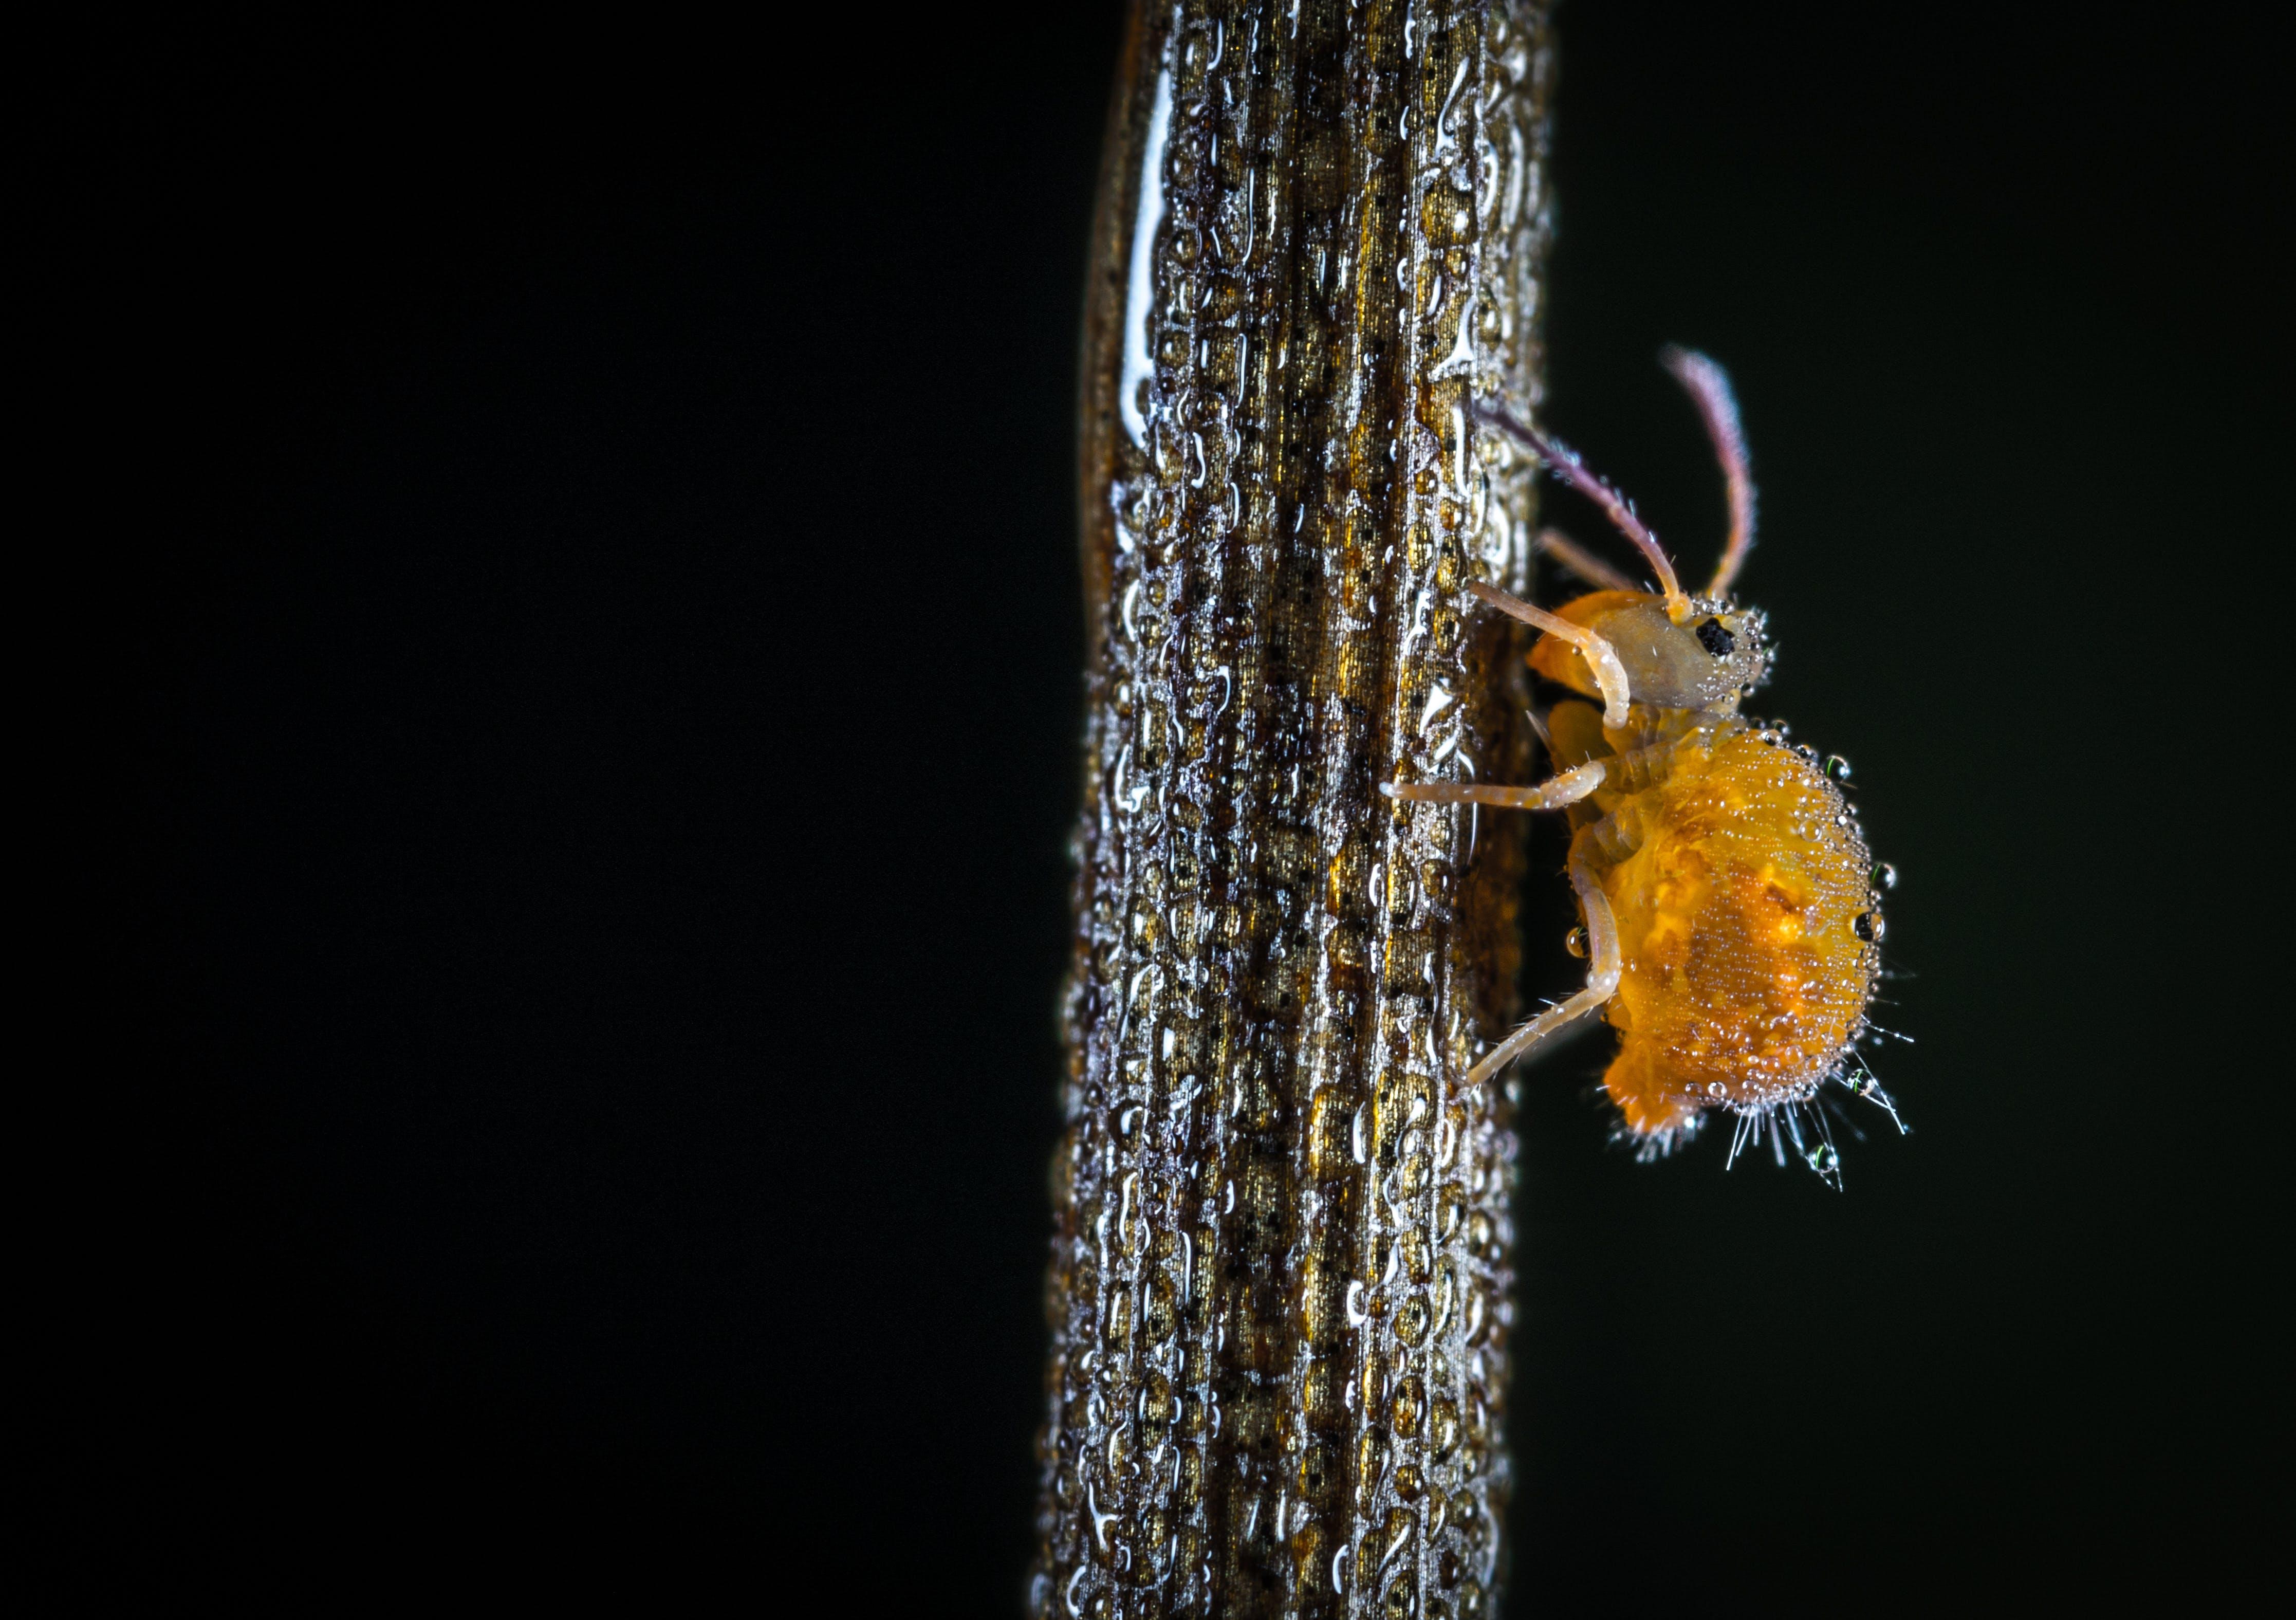 Macro Shot of Yellow Crawling Insect